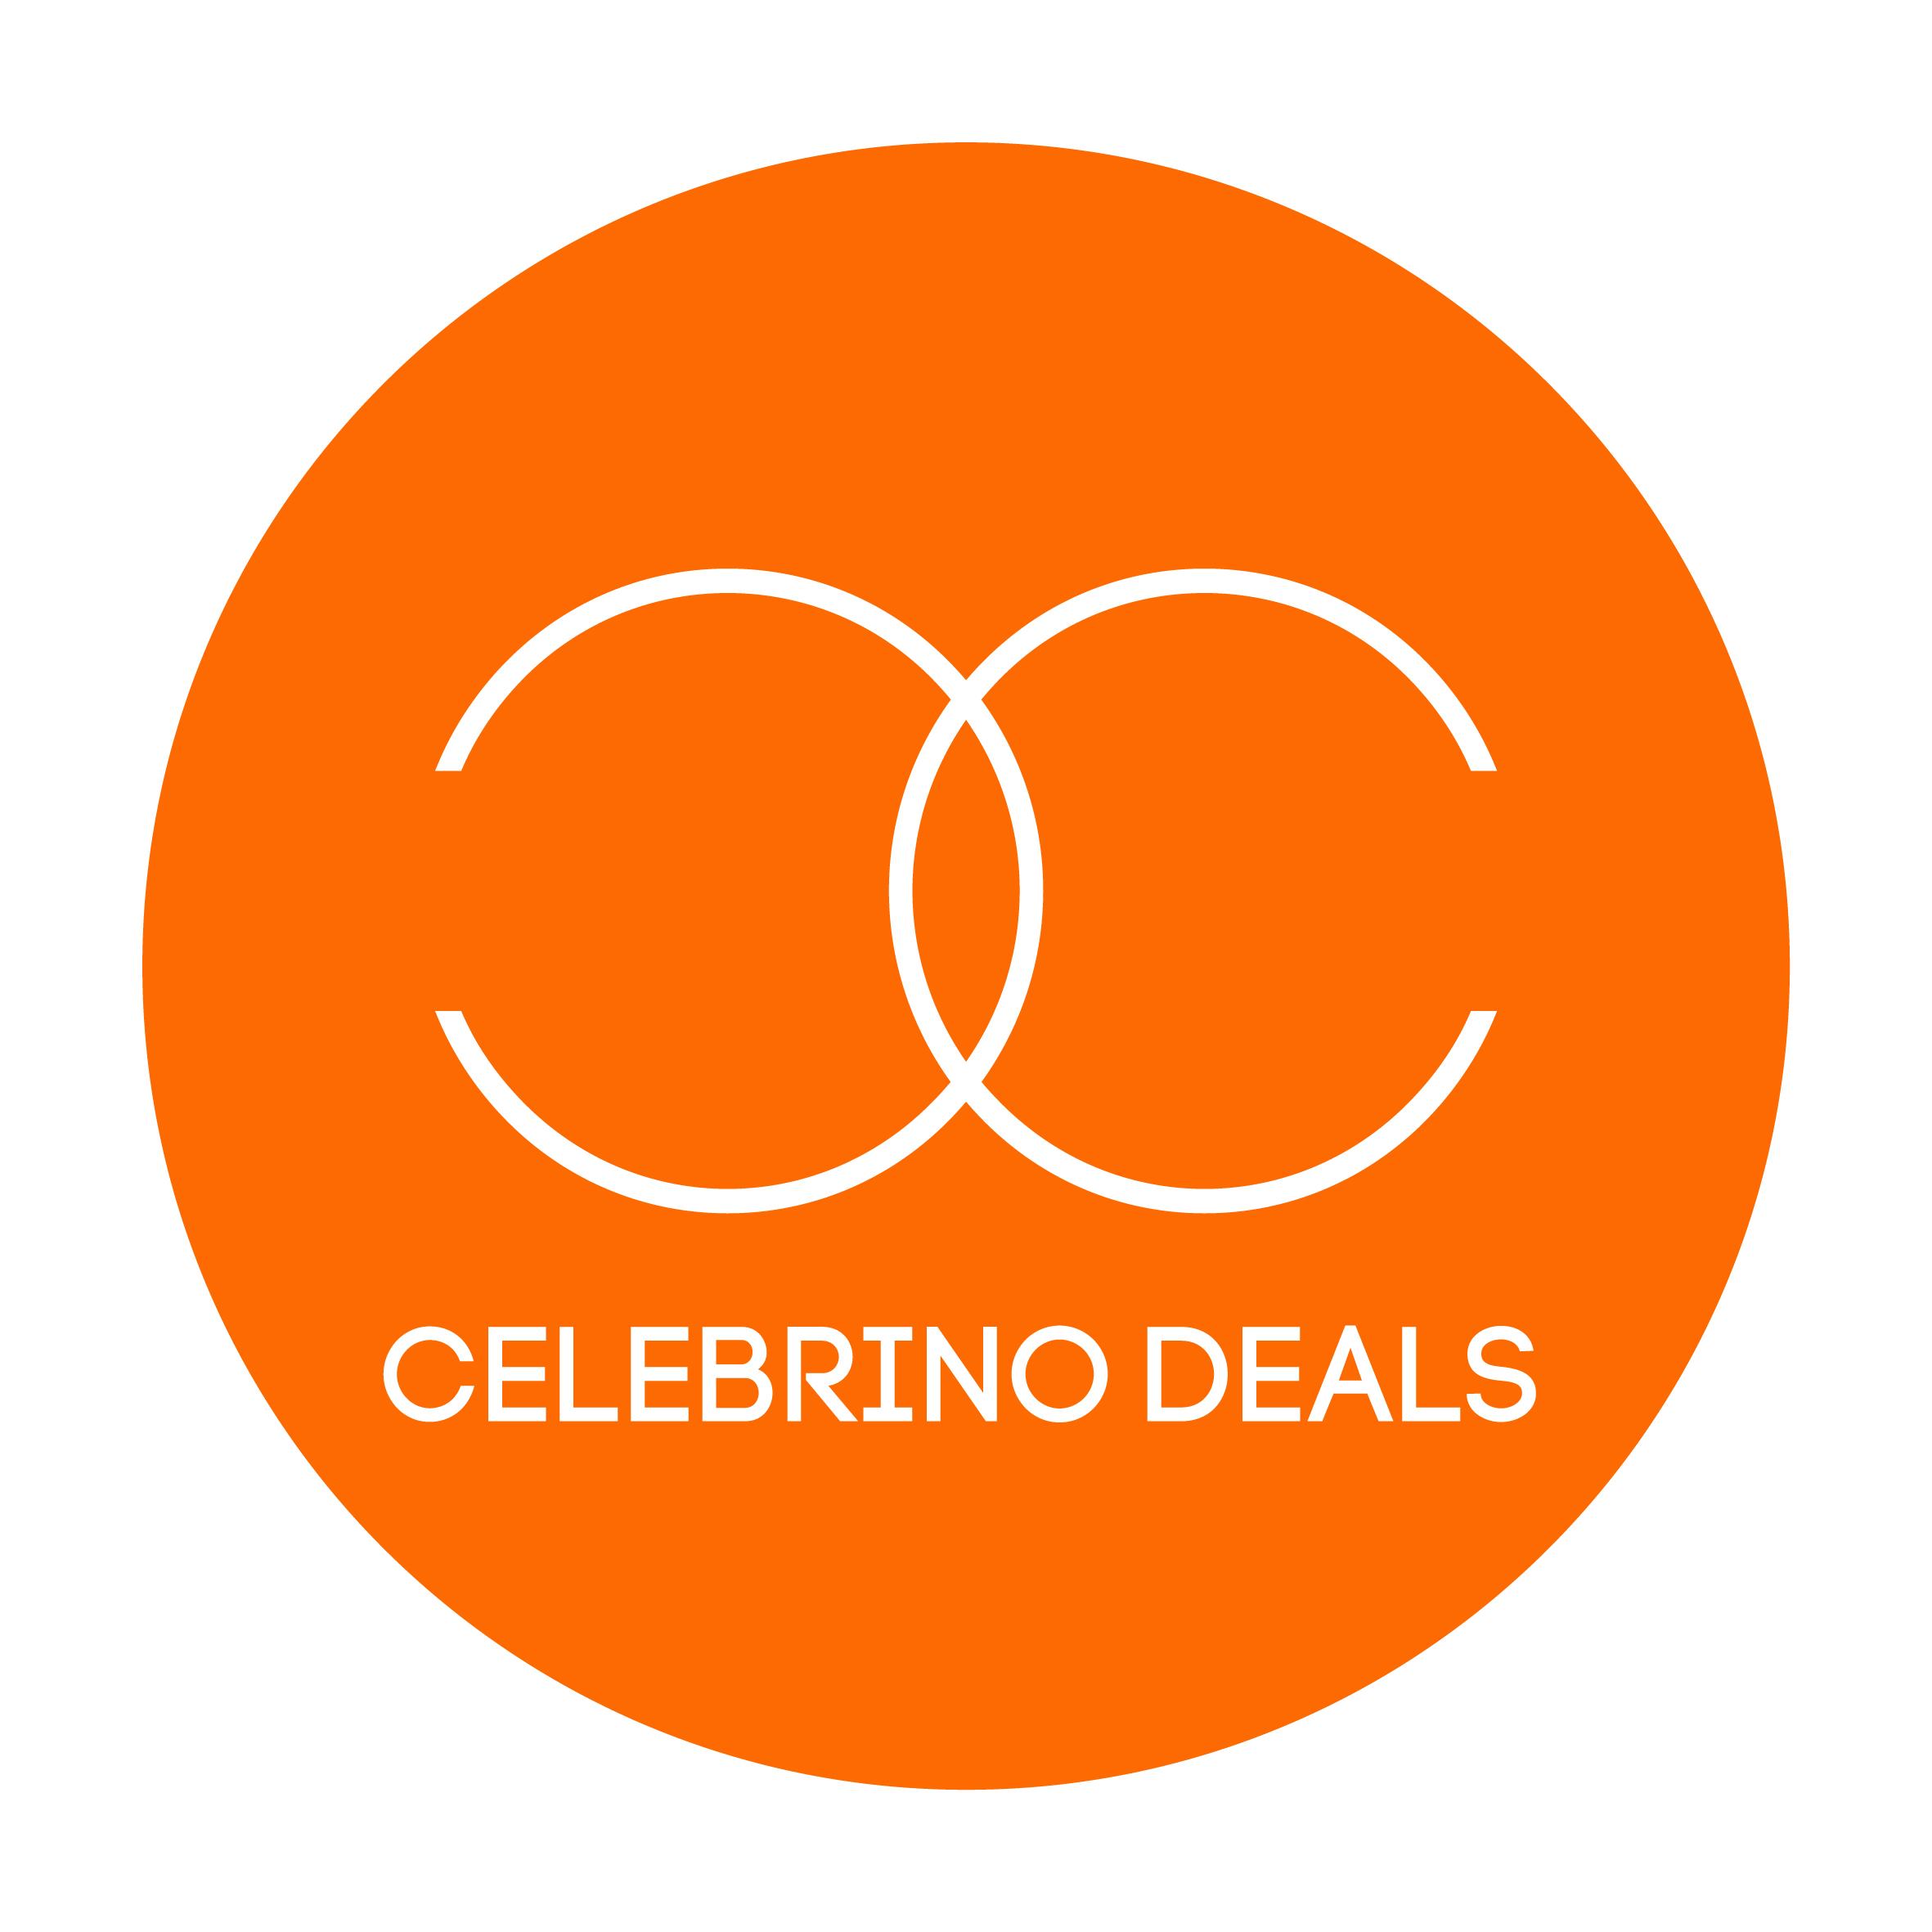 CelebrinoDeals